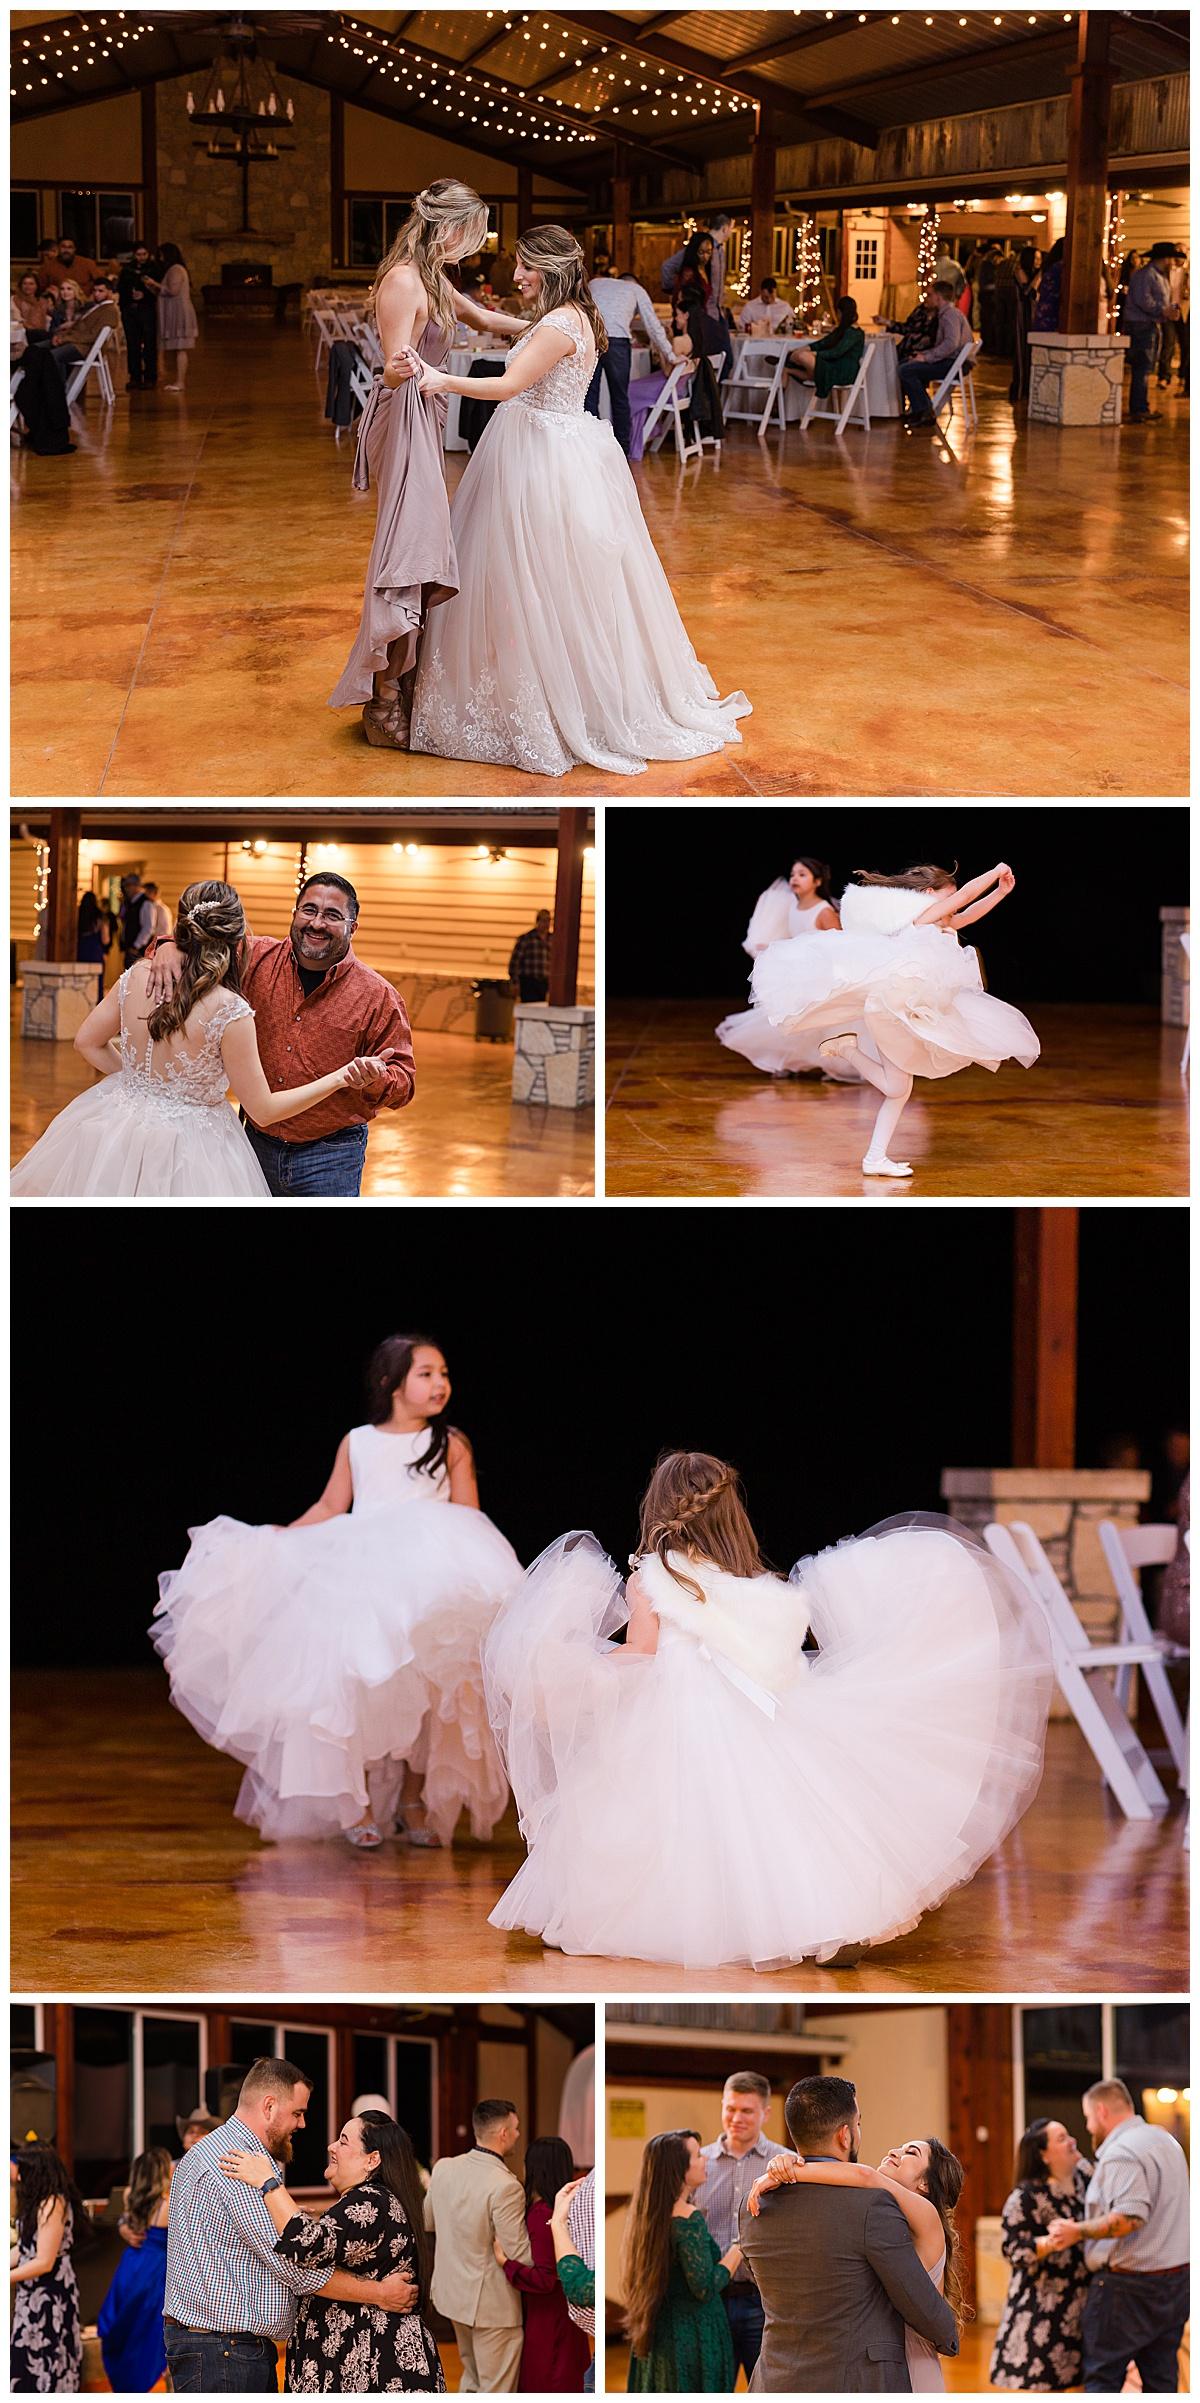 Wedding-Photographer-Texas-Hill-Country-Happy-H-Ranch-Comfor-Texas-Carly-Barton-Photography_0084.jpg